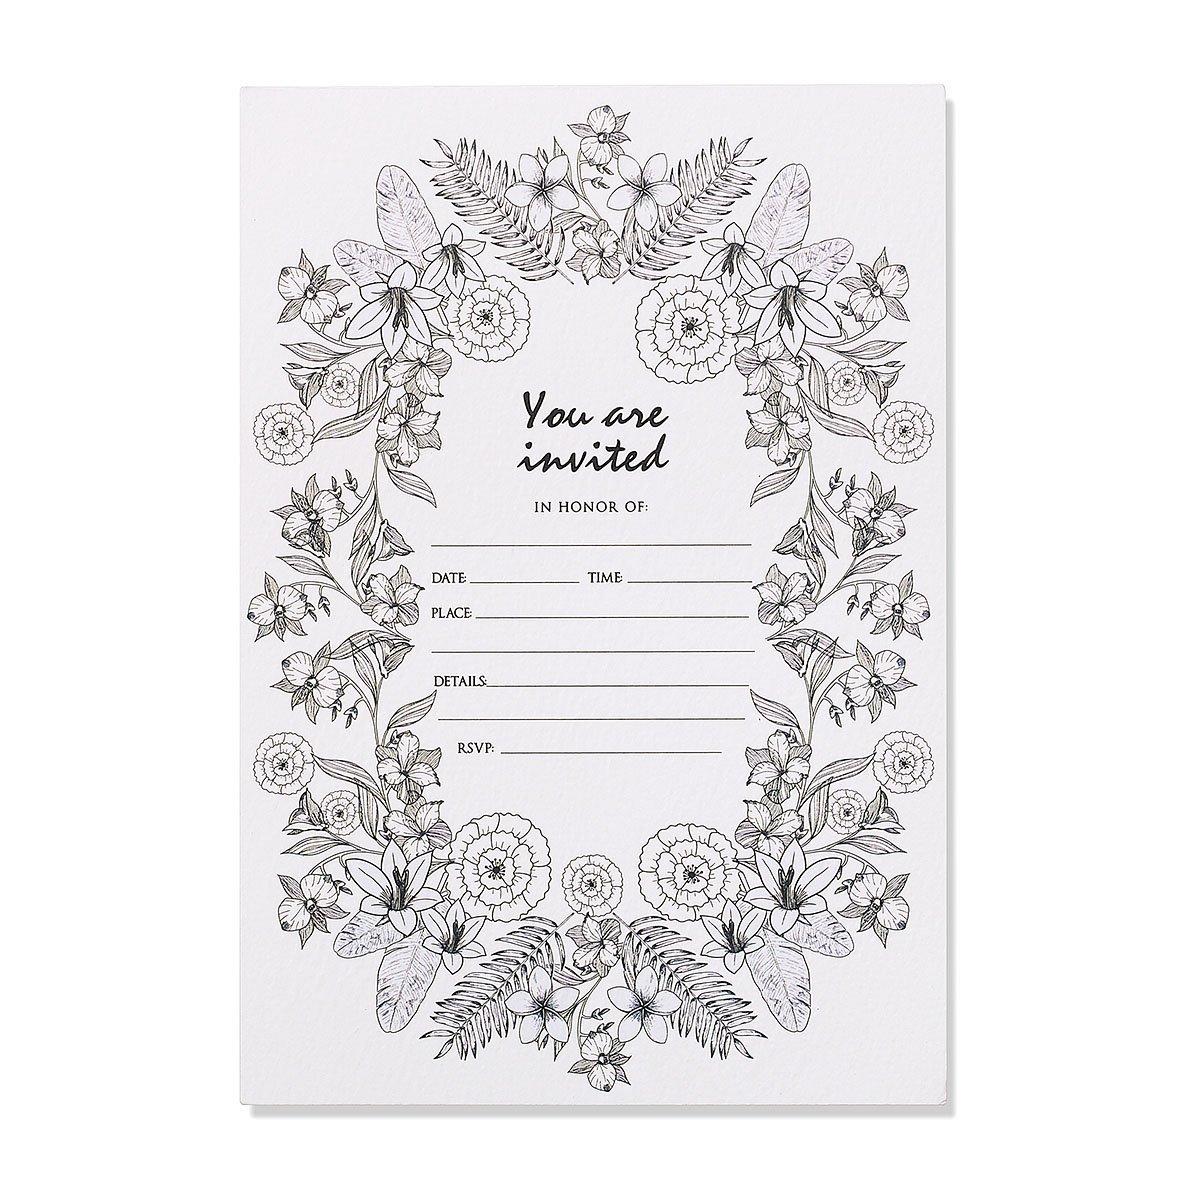 Get Quotations 30 Unique Invitations With Envelopes Elegant Party Invitation Cards Set Wedding Bridal Shower